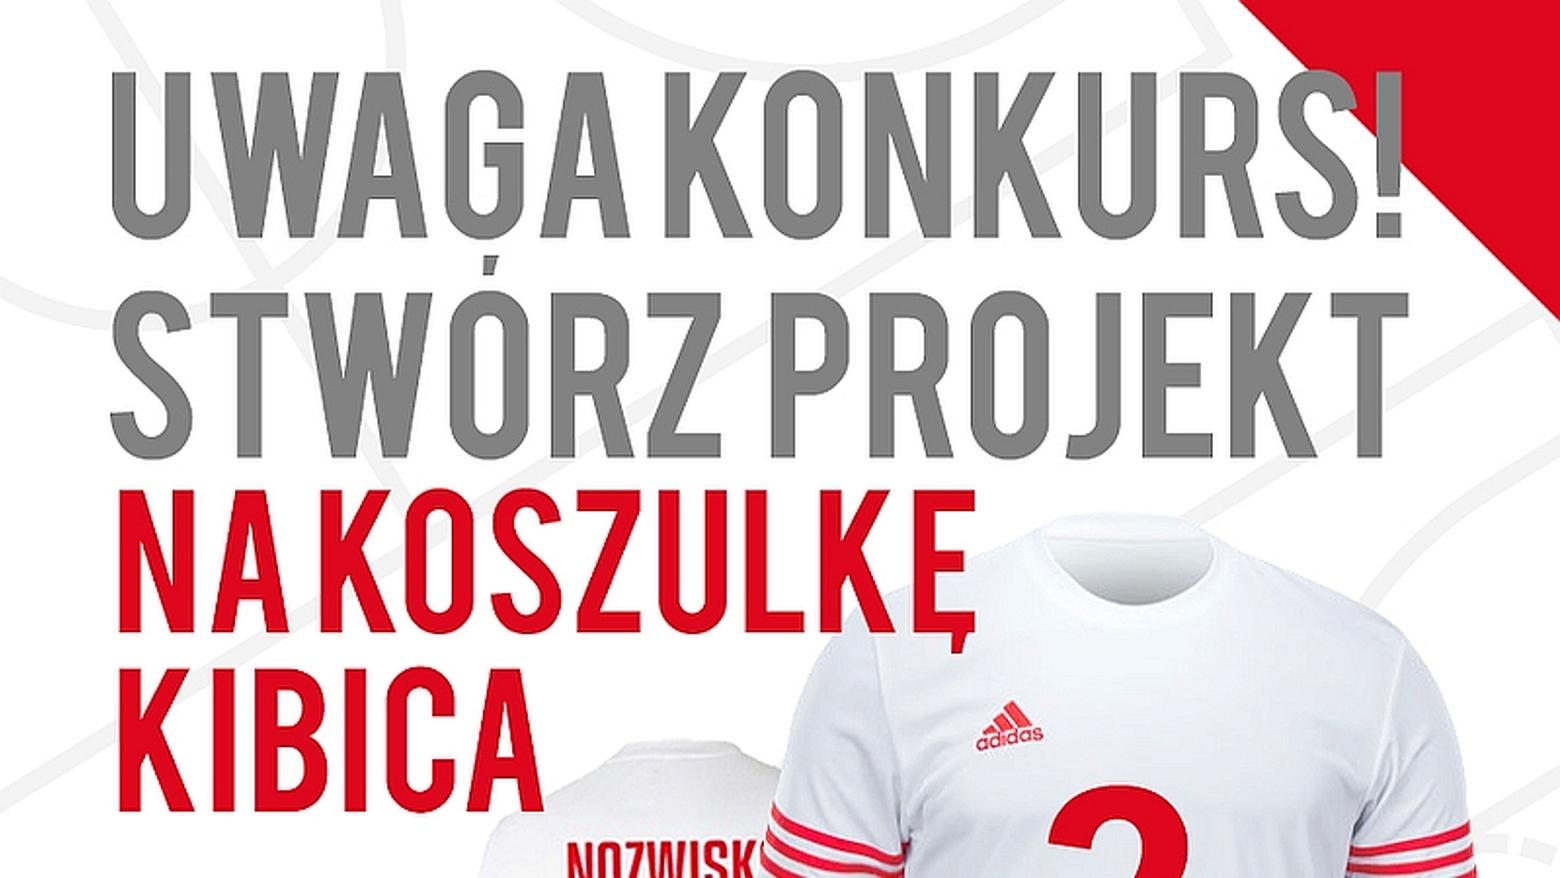 eeb361bf4 KoszKoszulka! – Zaprojektuj koszulkę Kibica Reprezentacji Polski